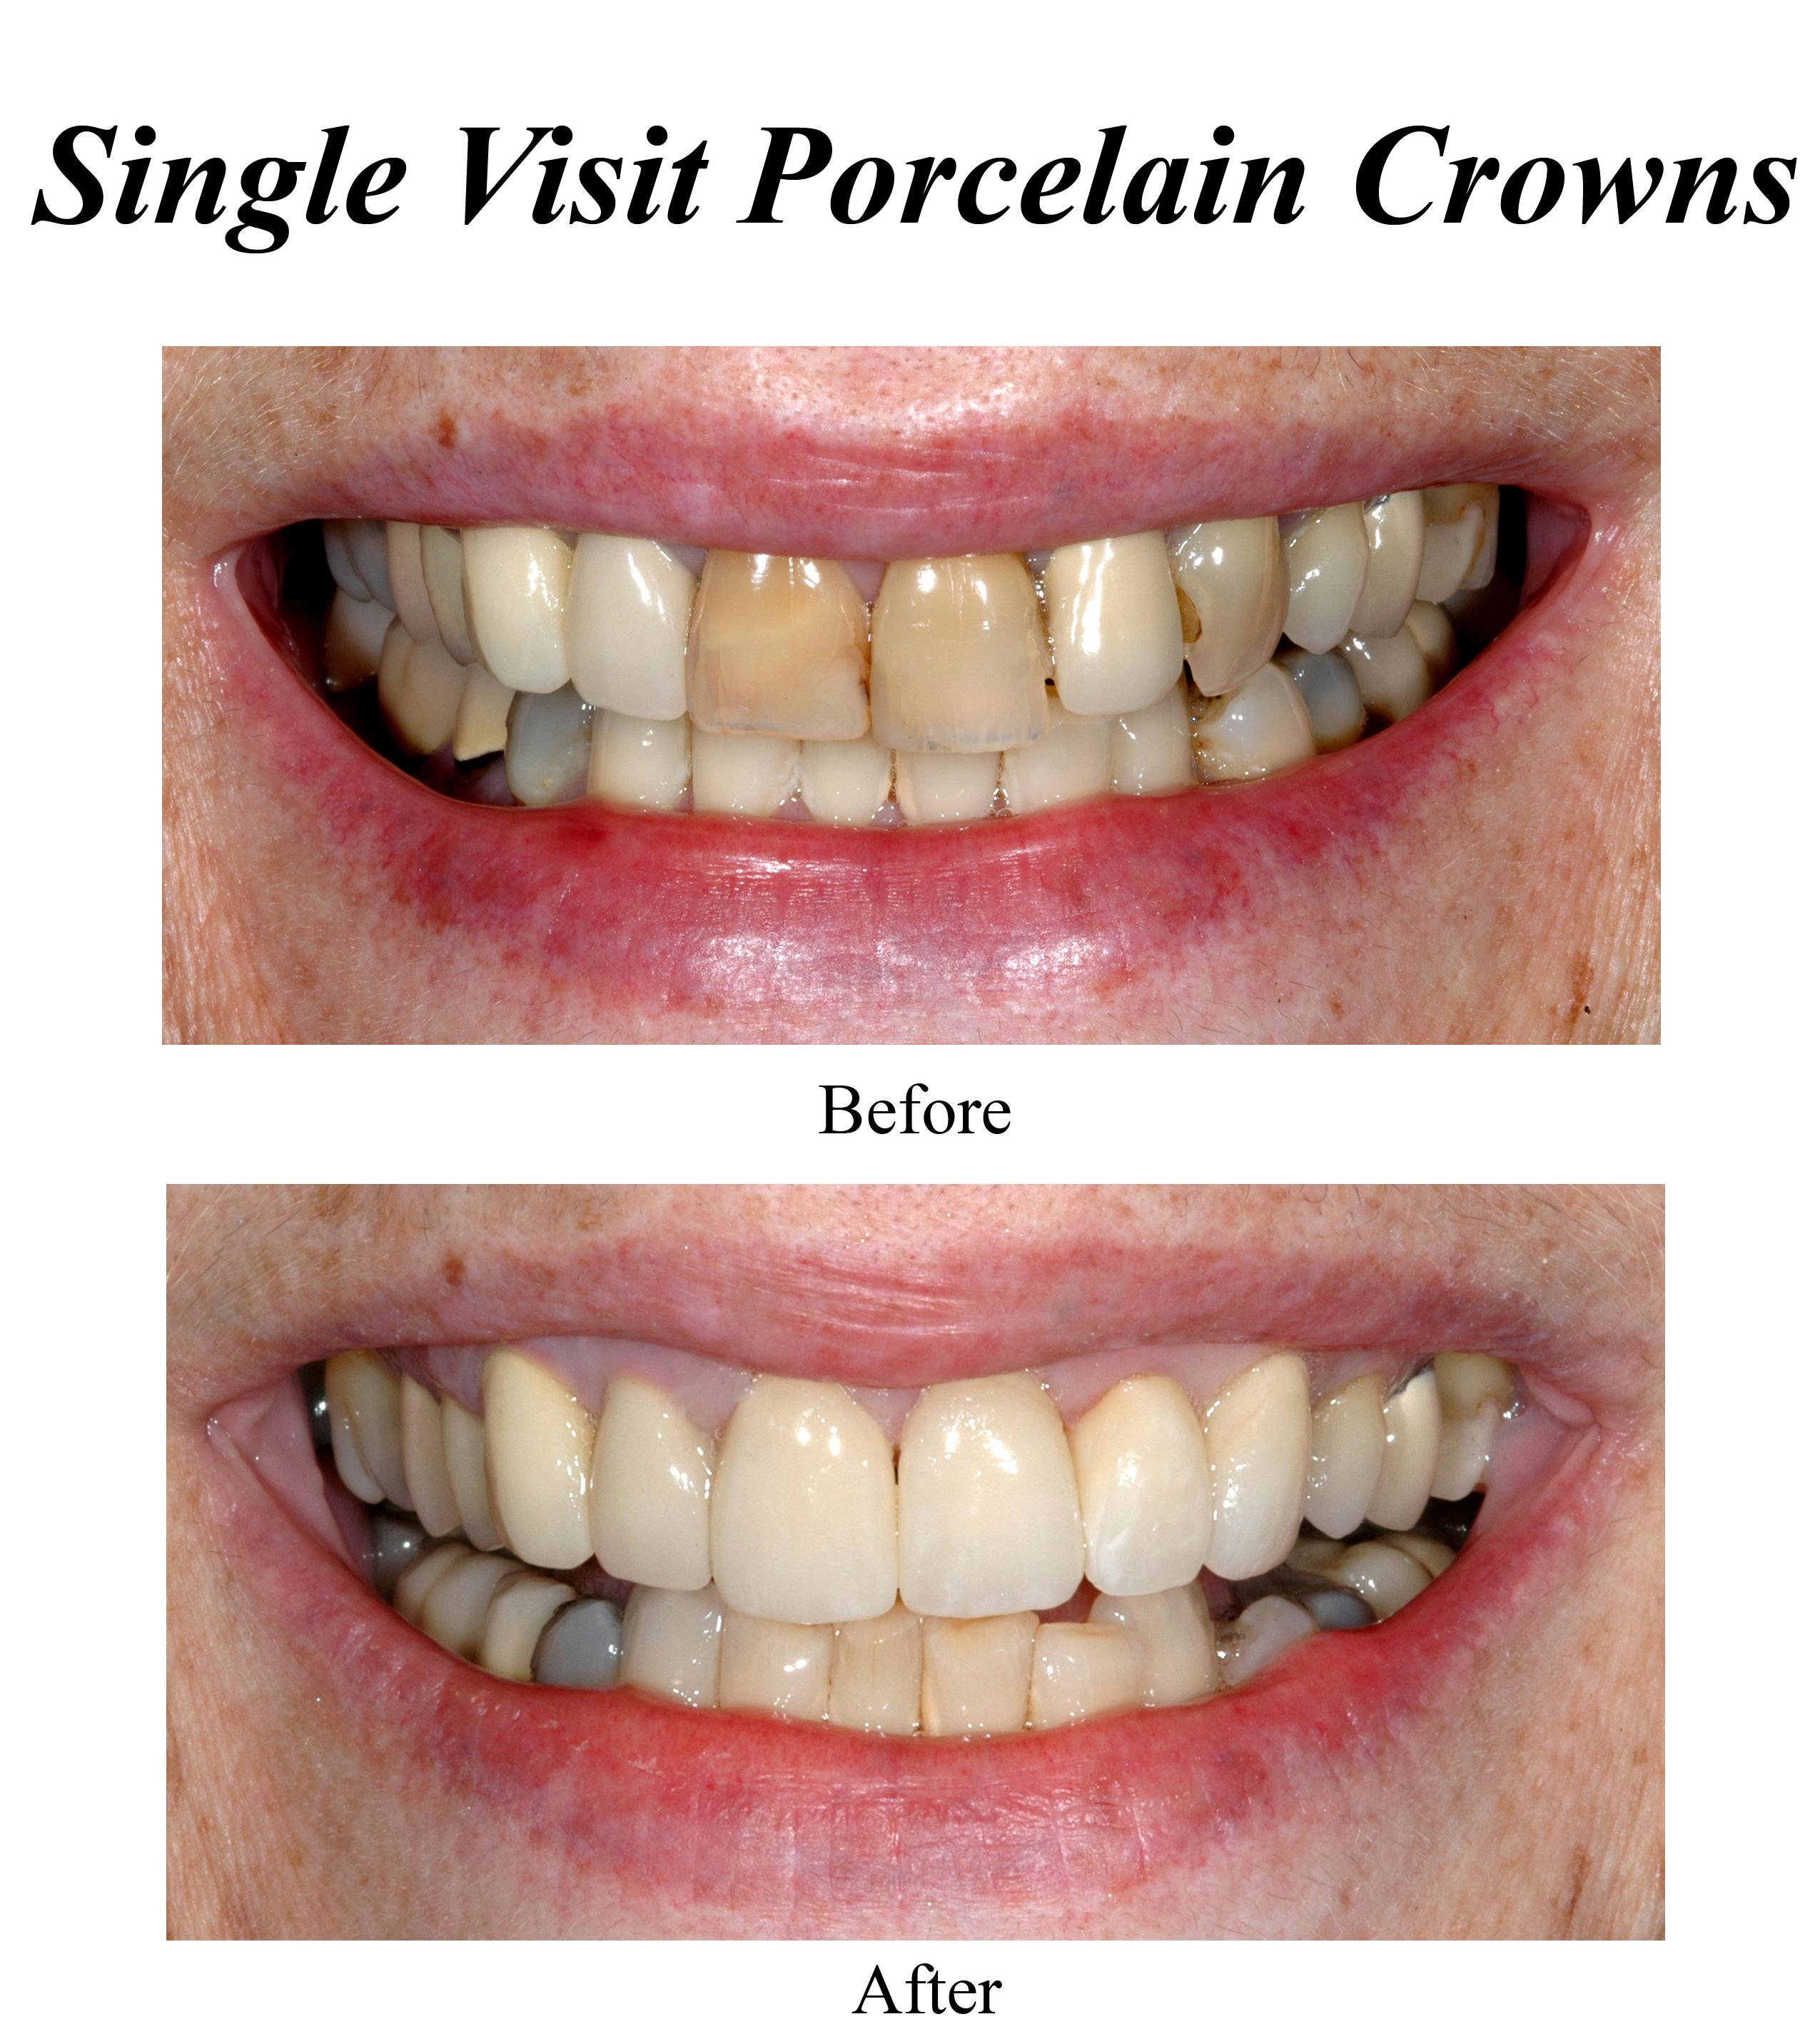 single-visit-porcelain-crowns-2